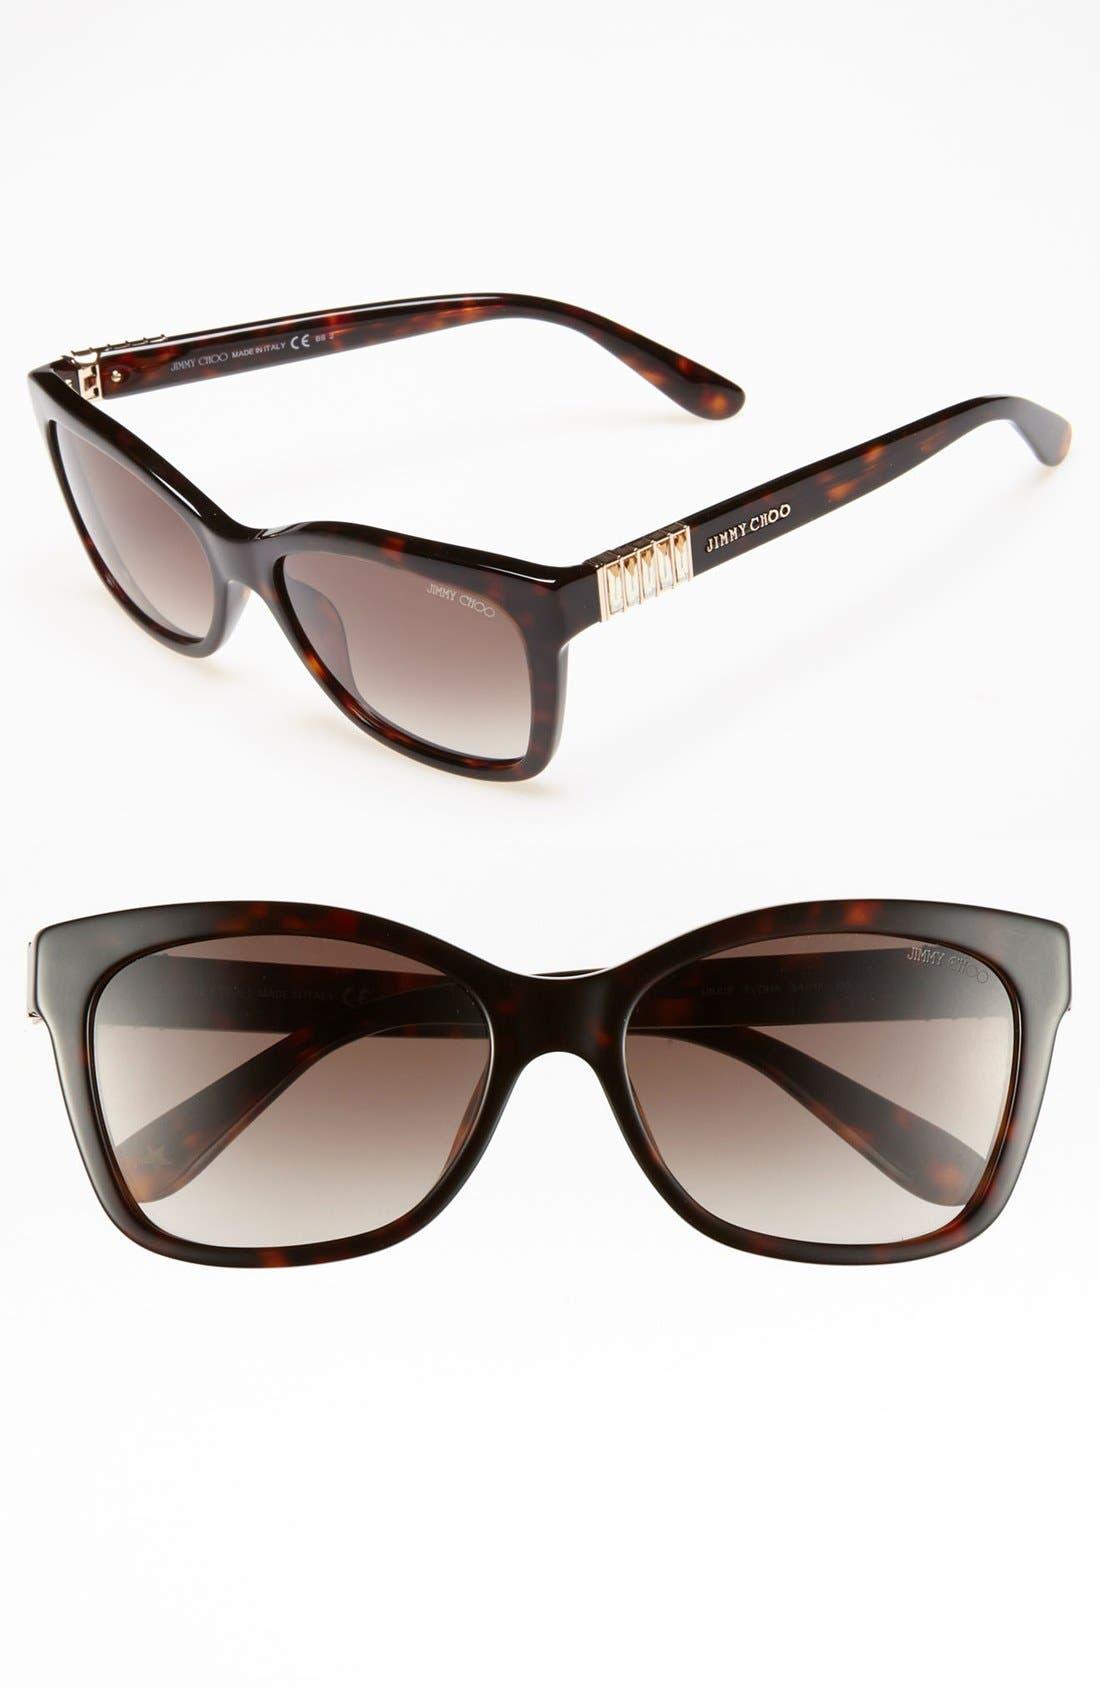 Alternate Image 1 Selected - Jimmy Choo 'Mimi' 54mm Sunglasses